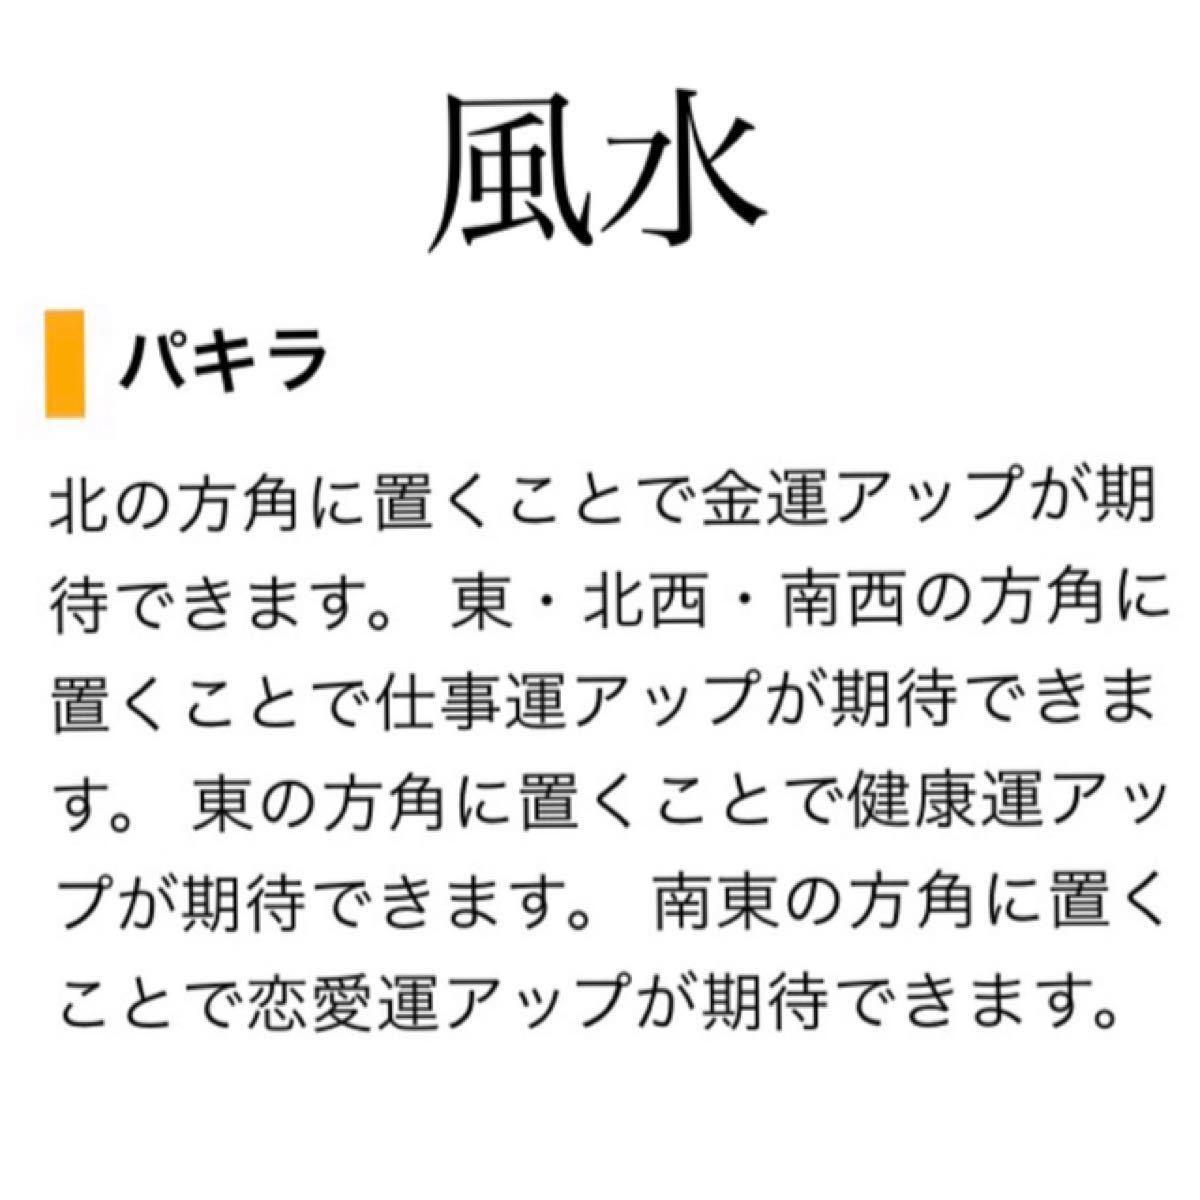 【AK】美苗 金運UP 発財樹 太幹 パキラ 抜き苗